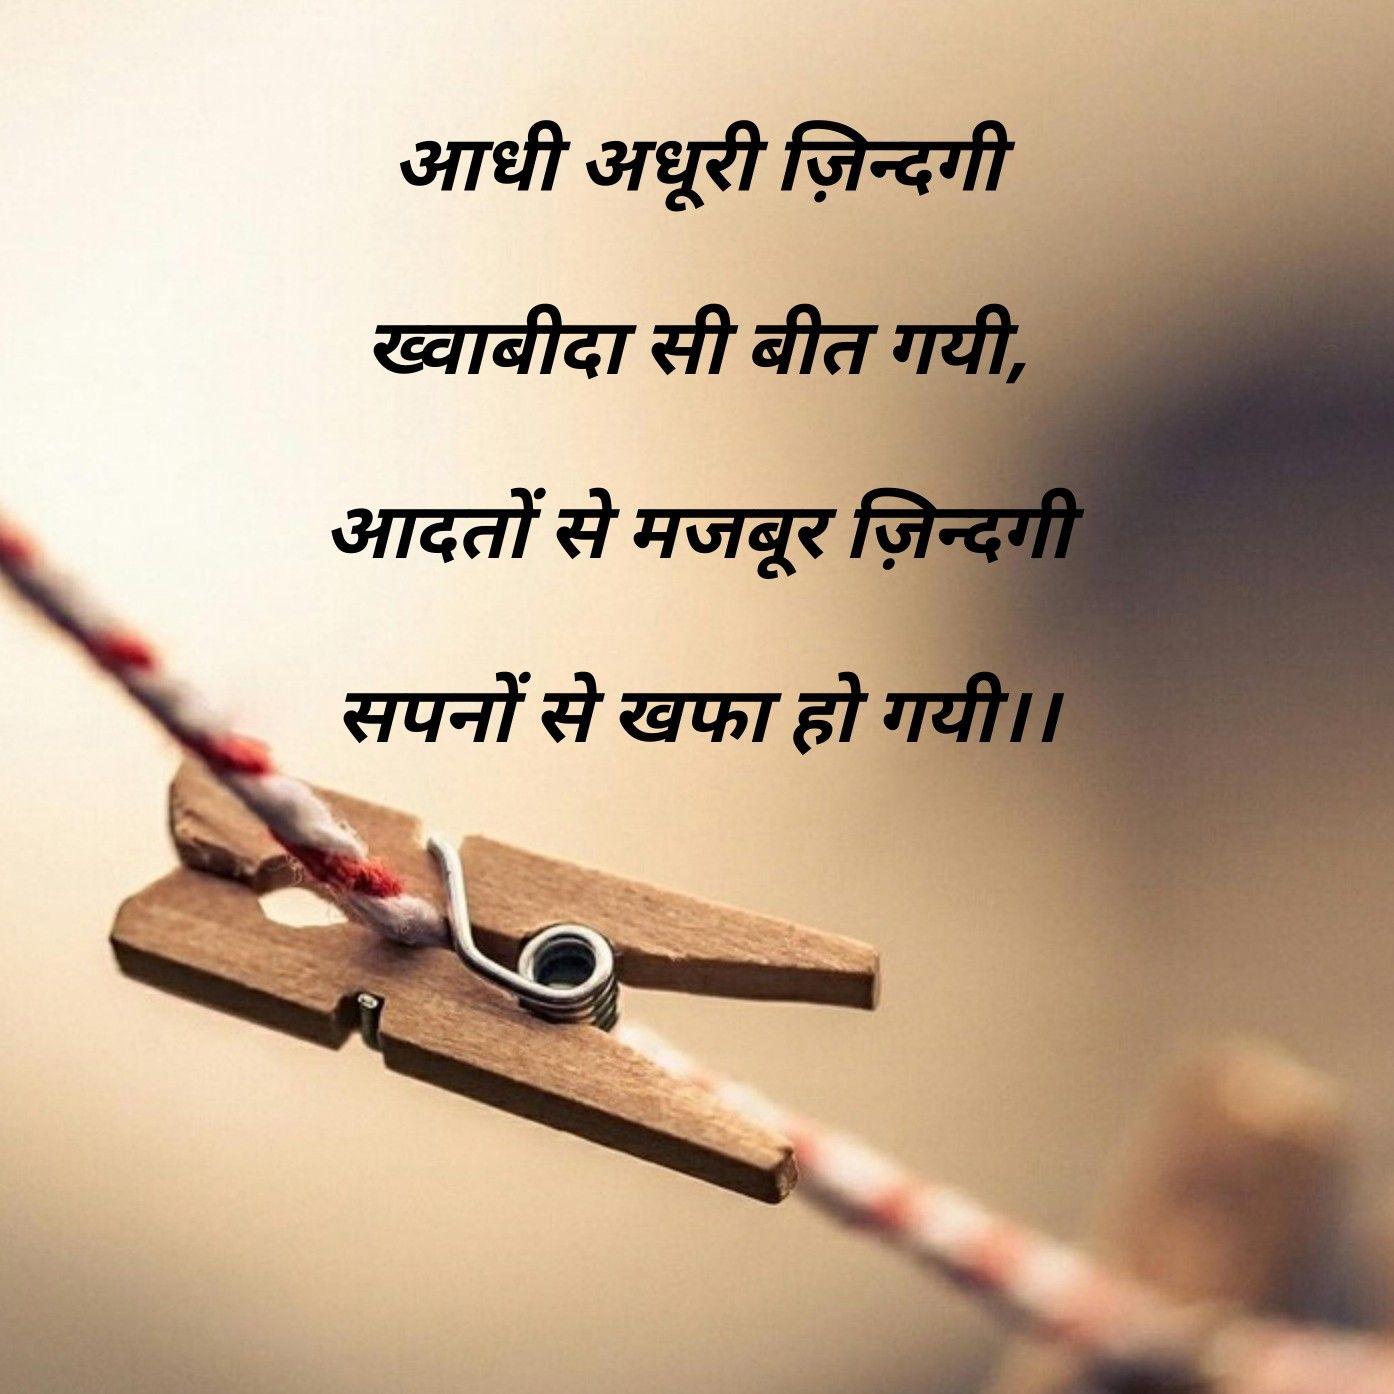 ख्वाबीदा #hindi #words #lines #story #short | Life quotes ...